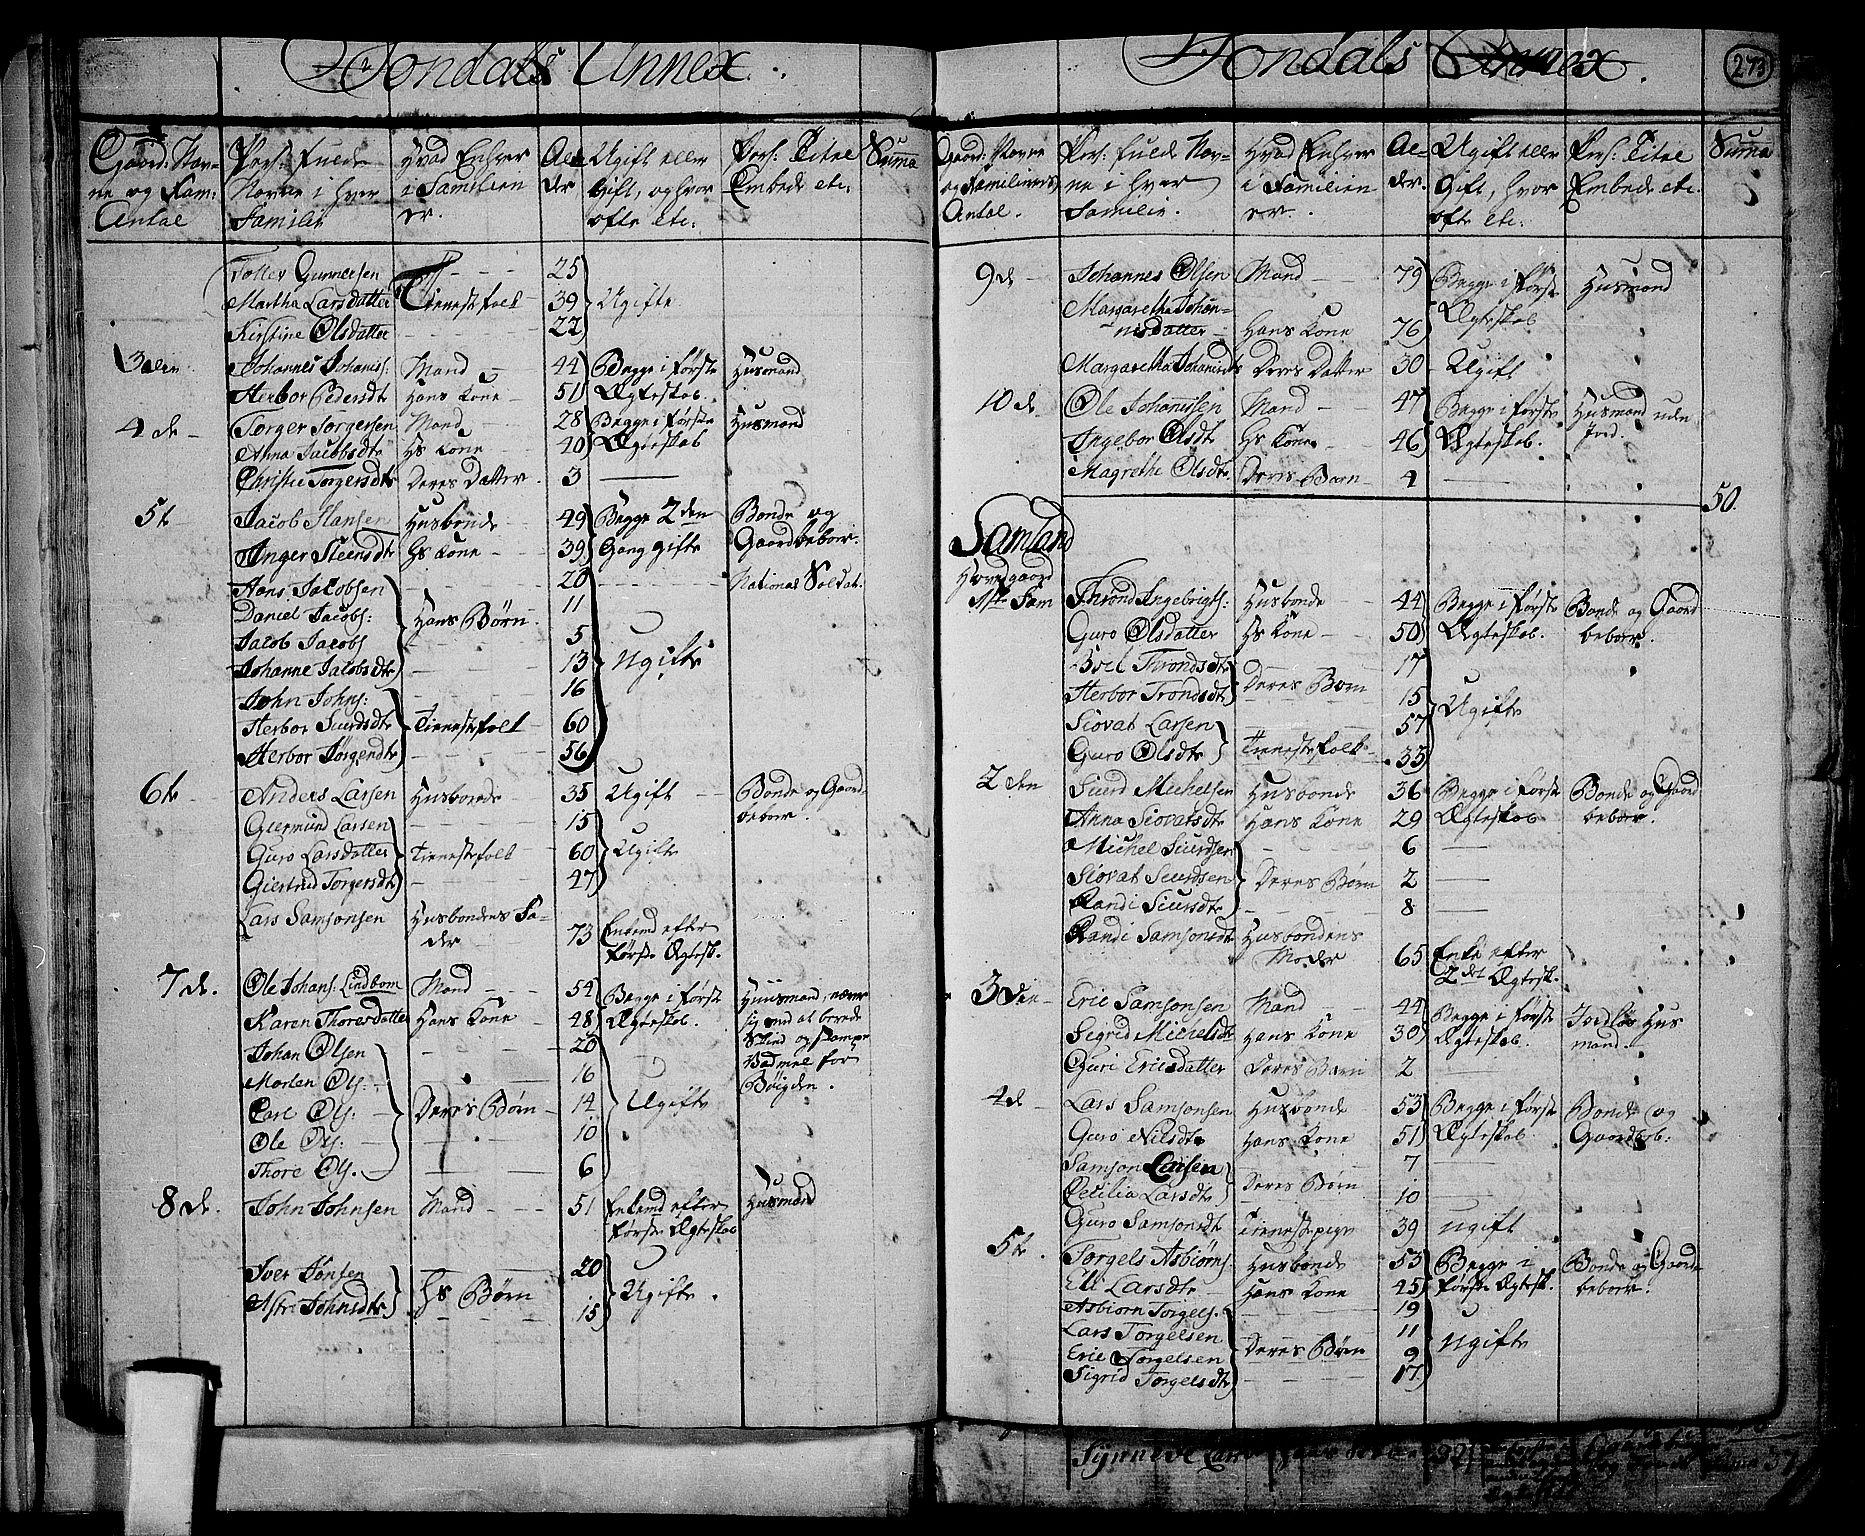 RA, Folketelling 1801 for 1226P Strandebarm prestegjeld, 1801, s. 272b-273a